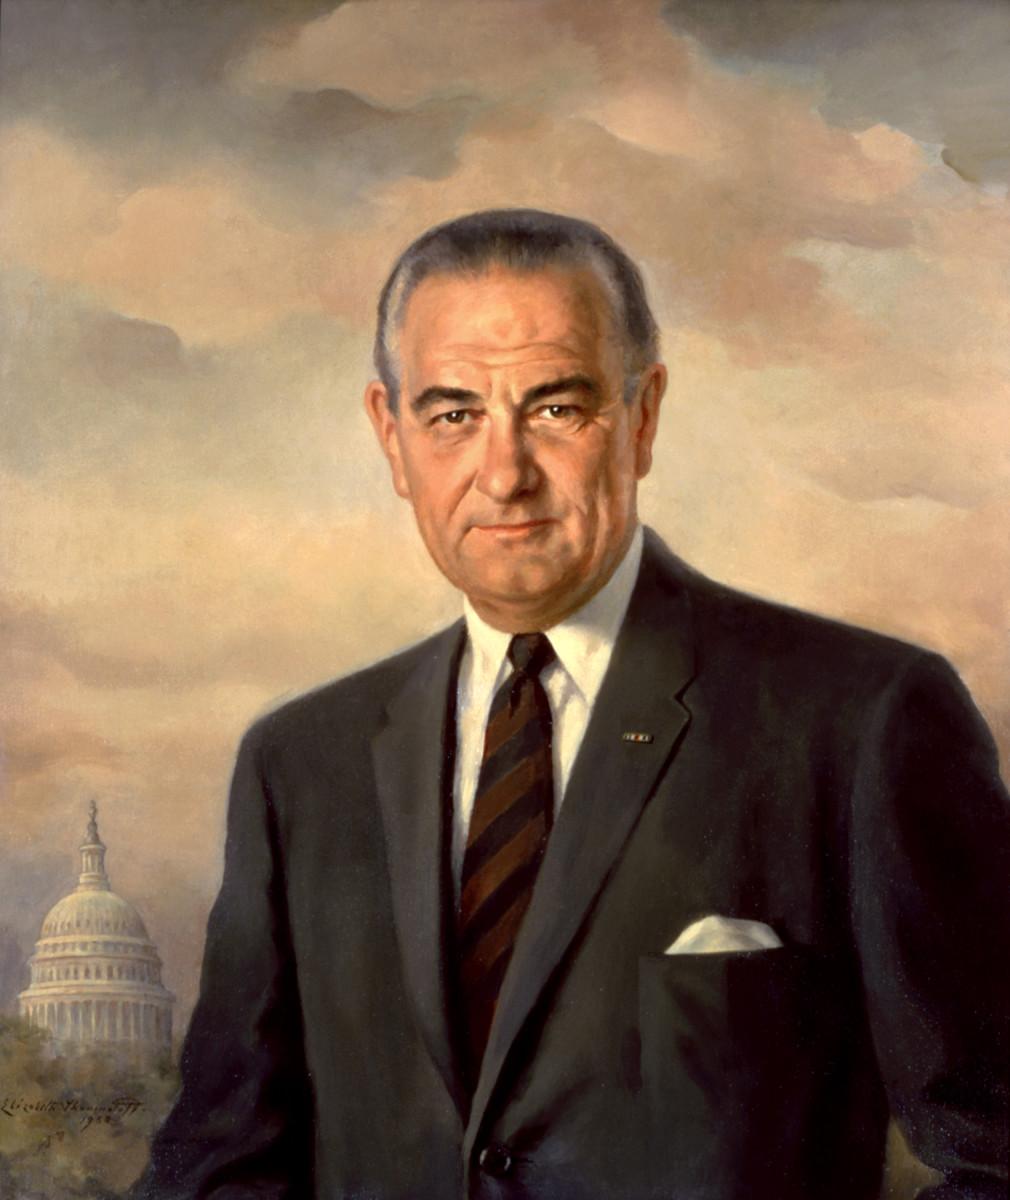 #36. Lyndon B. Johnson